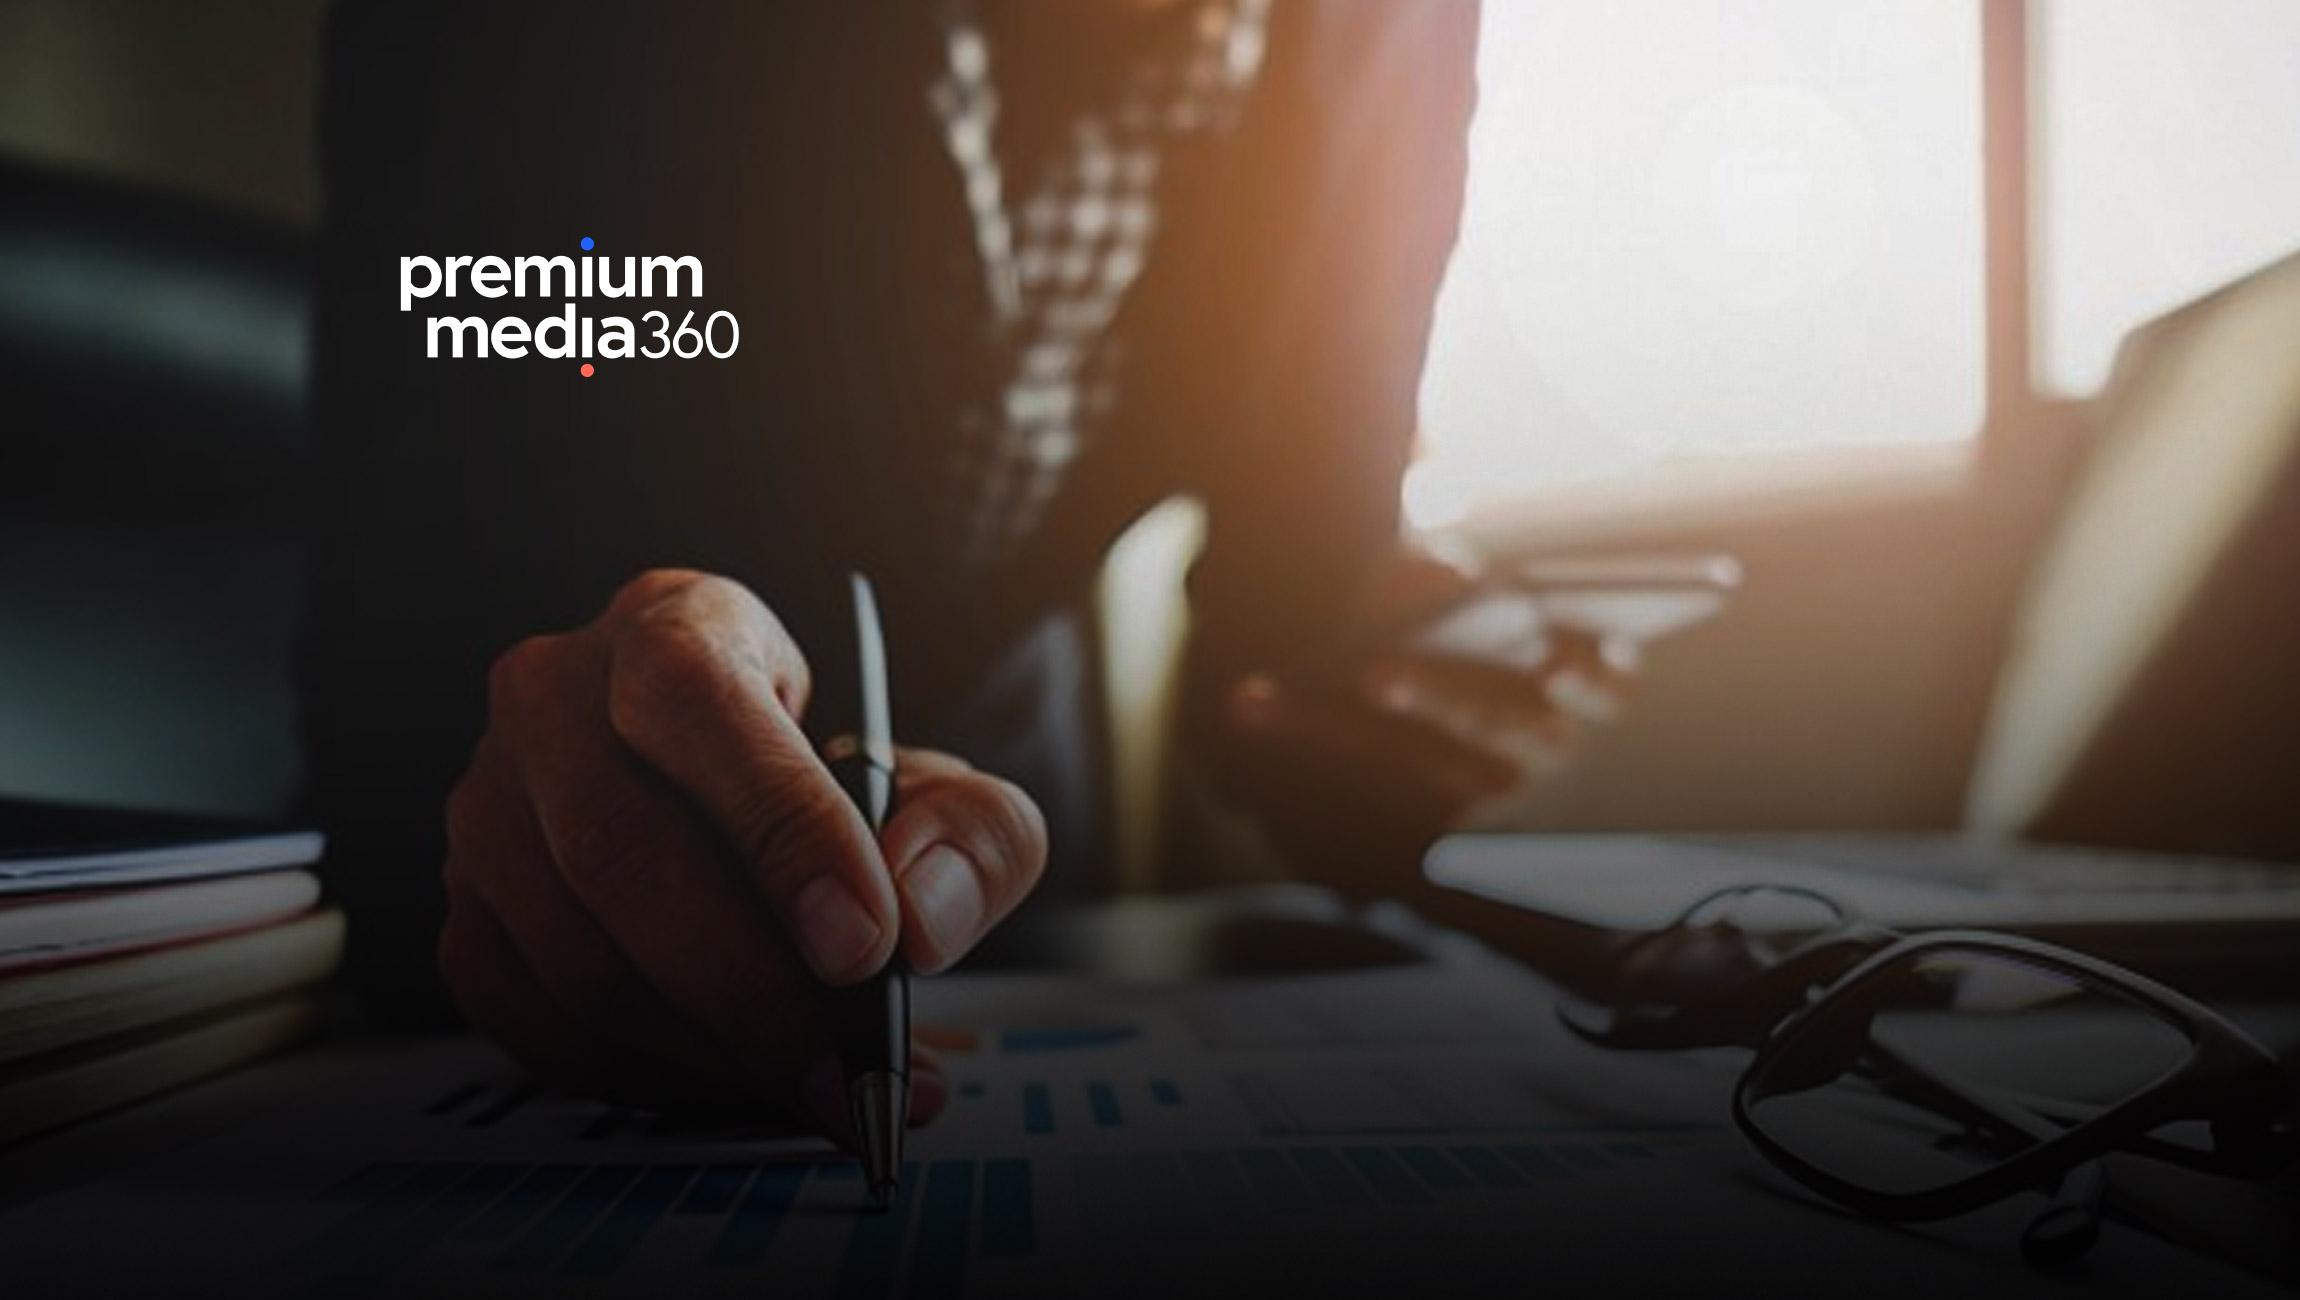 PremiumMedia360 Hires Multiple Key Executives Amid Significant Growth